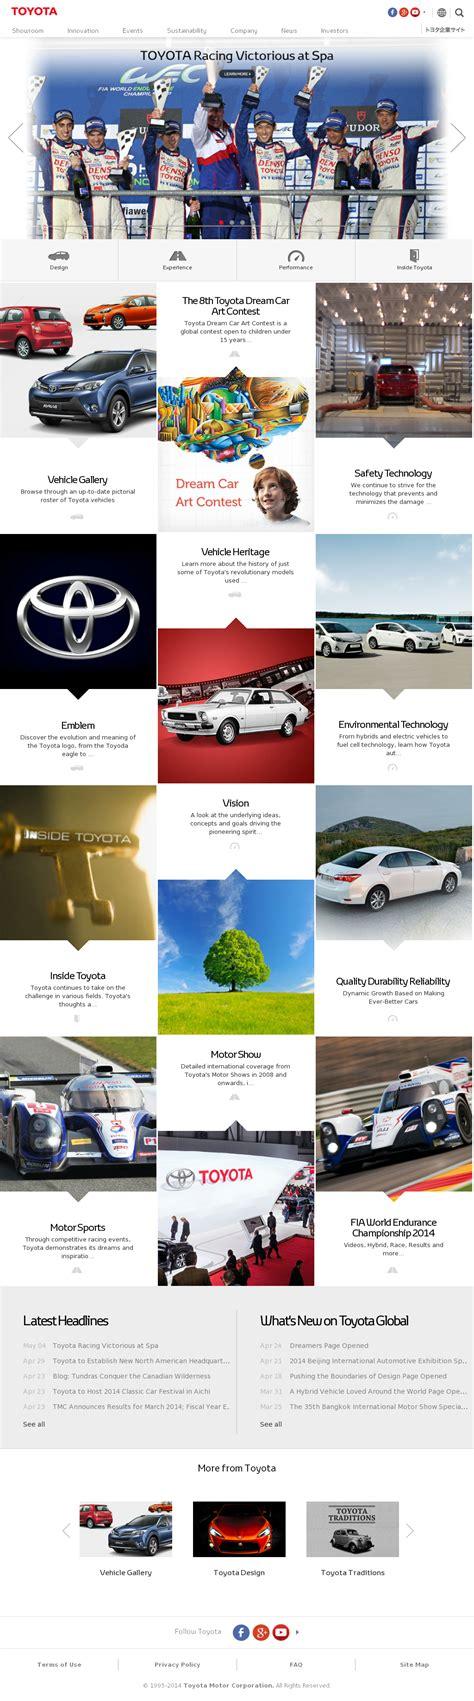 toyota company information toyota company profile owler